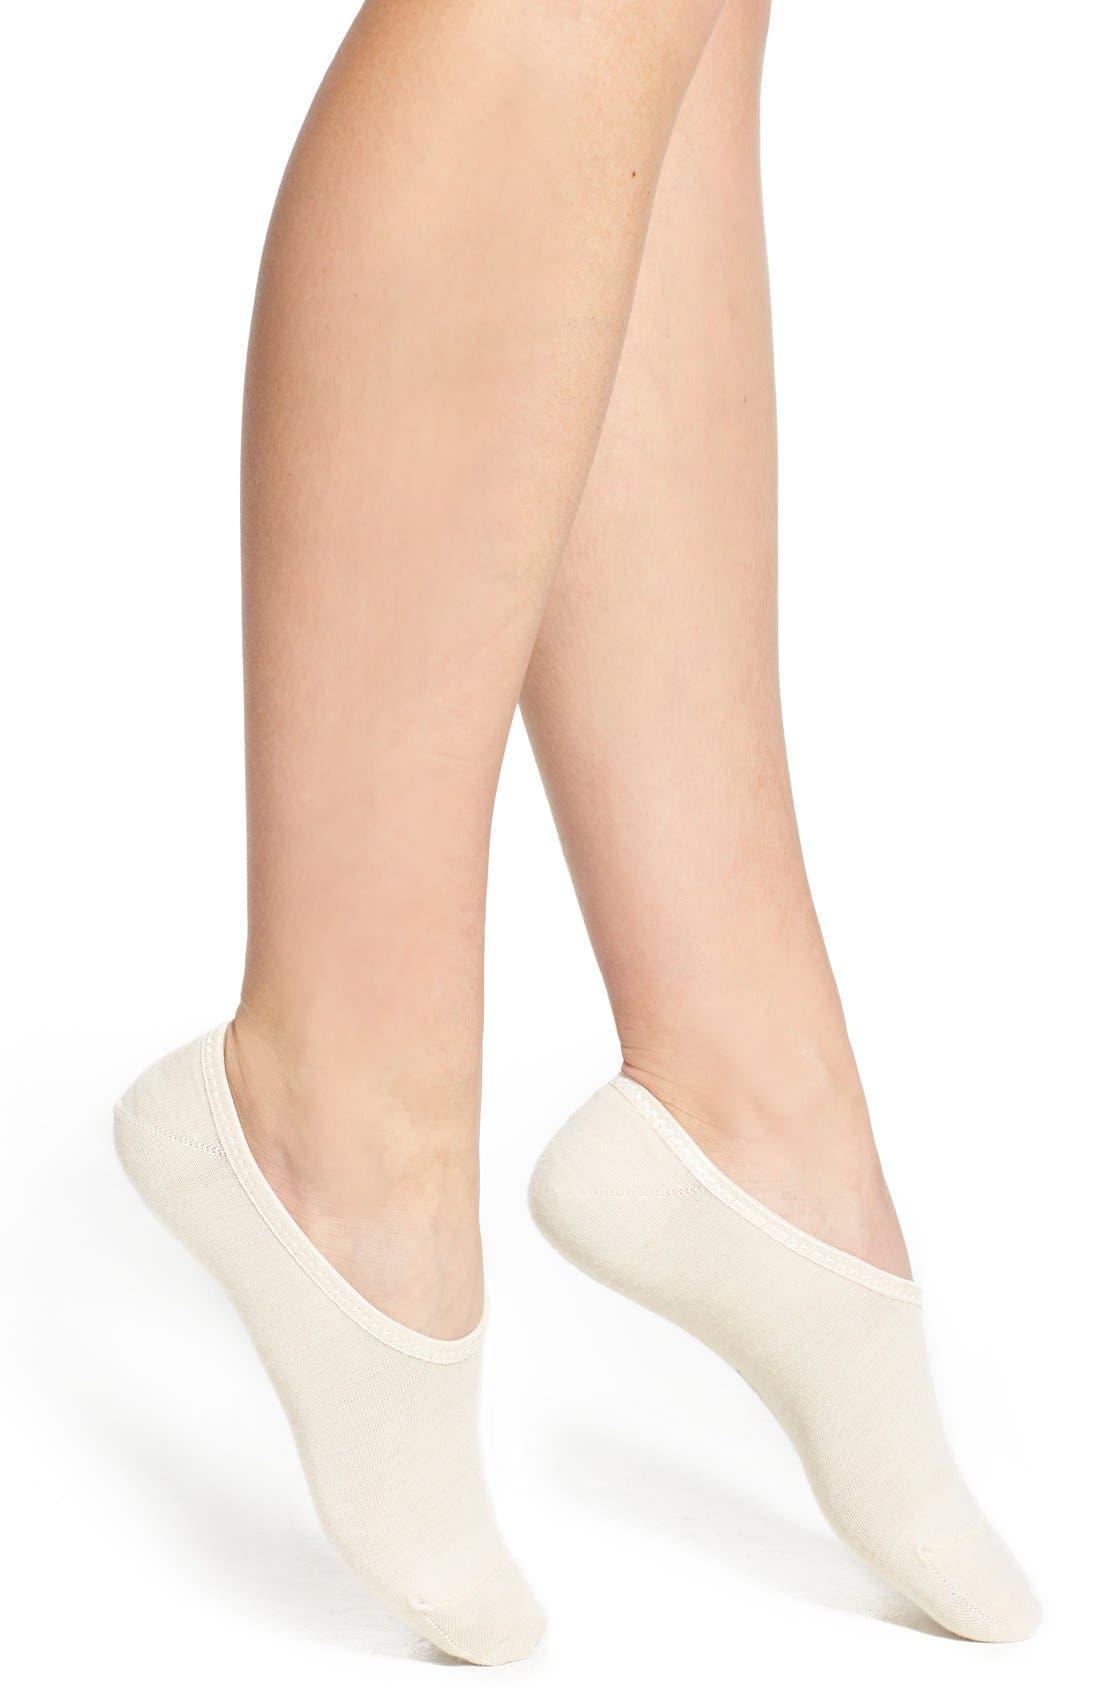 Alternate Image 1 Selected - Smartwool 'Hide and Seek' No-Show Socks